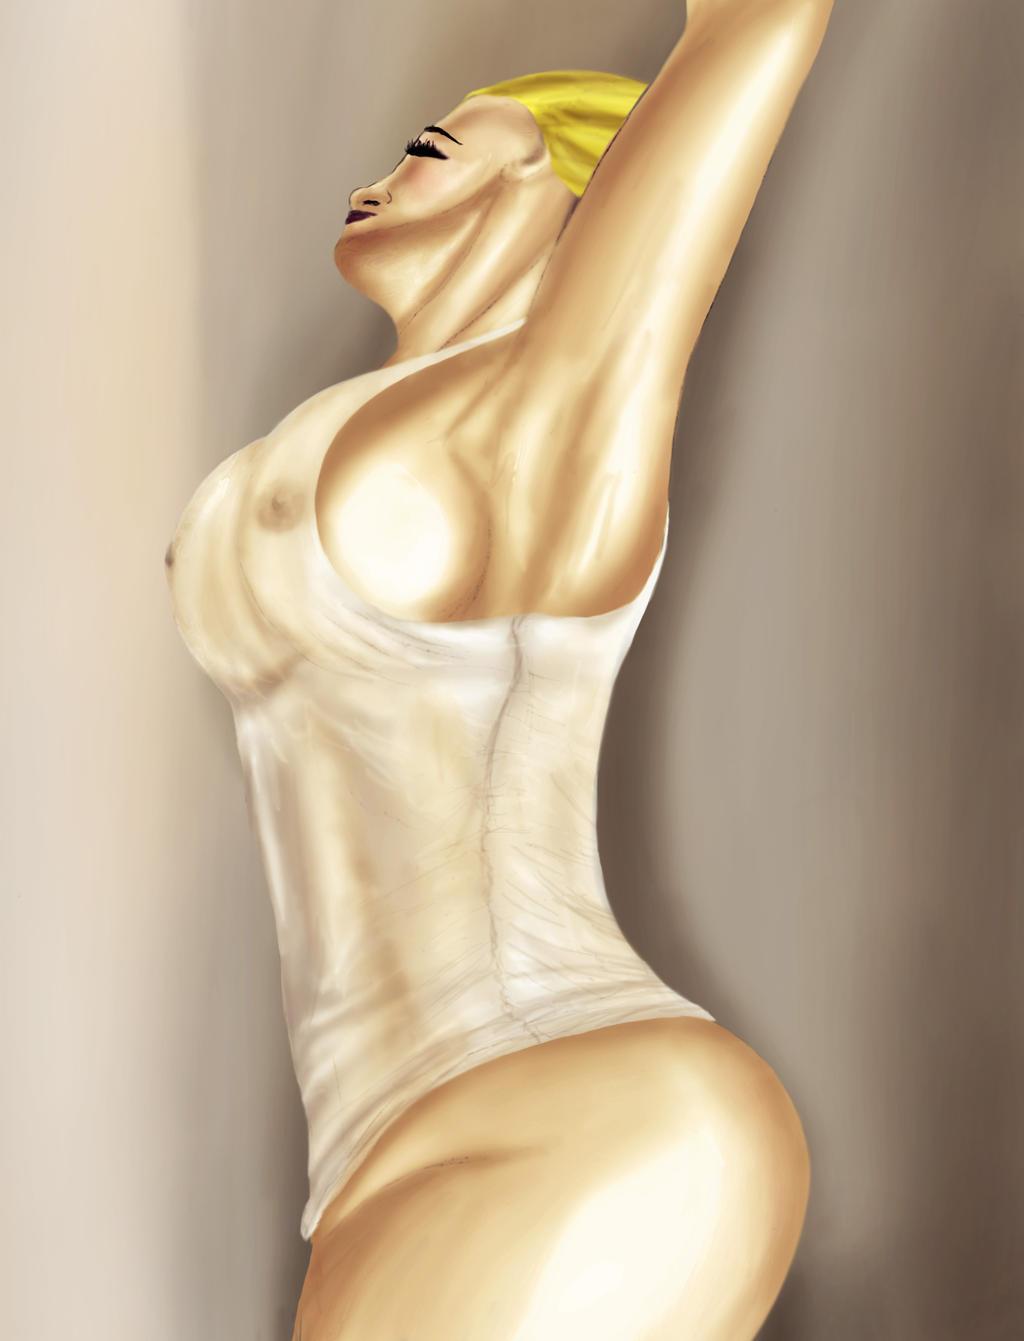 Alexandra sexy by otalon12